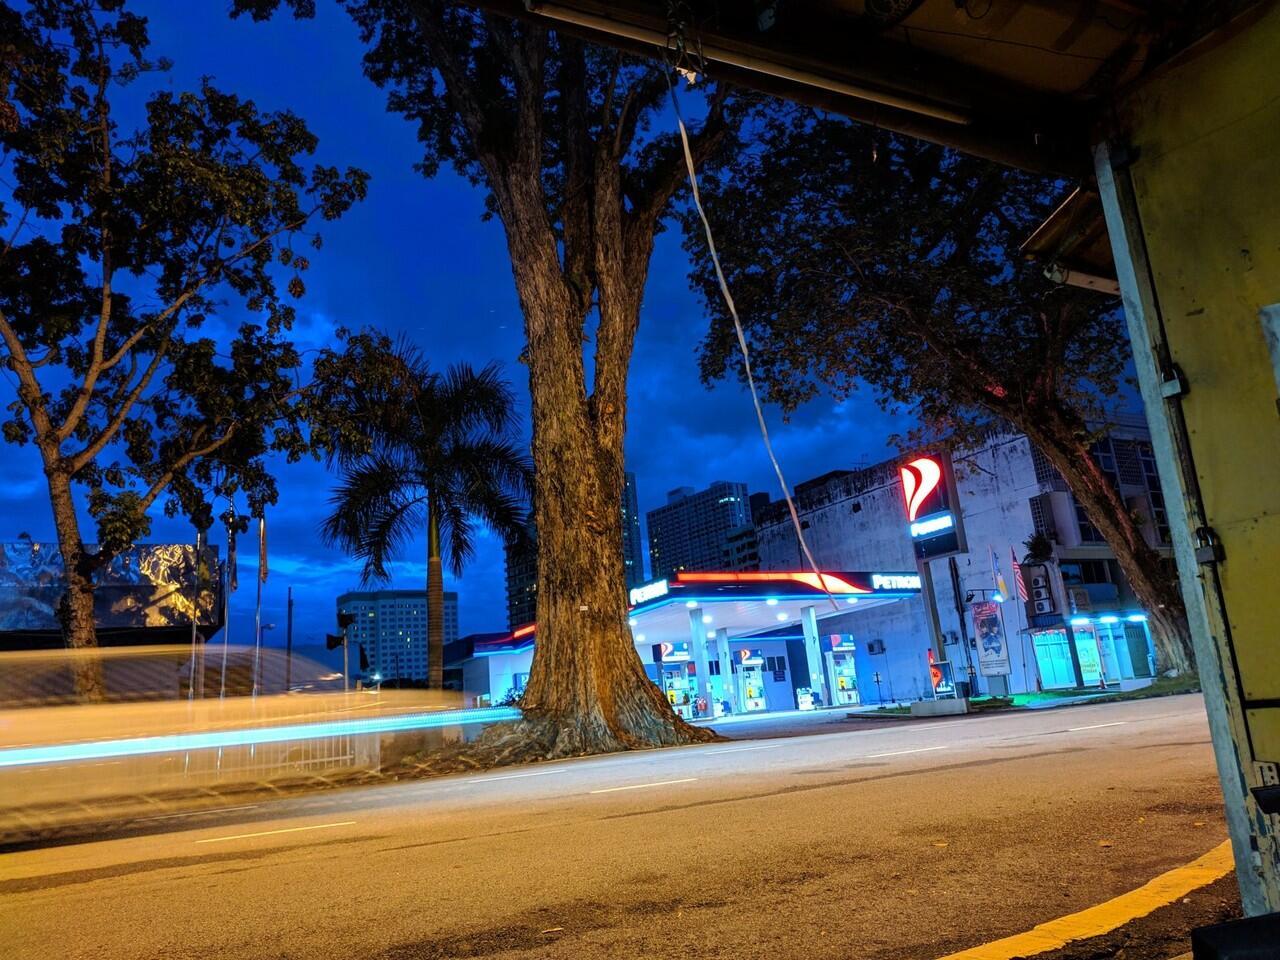 Redmi Note 5 whyred + GCam Night Sight | KASKUS